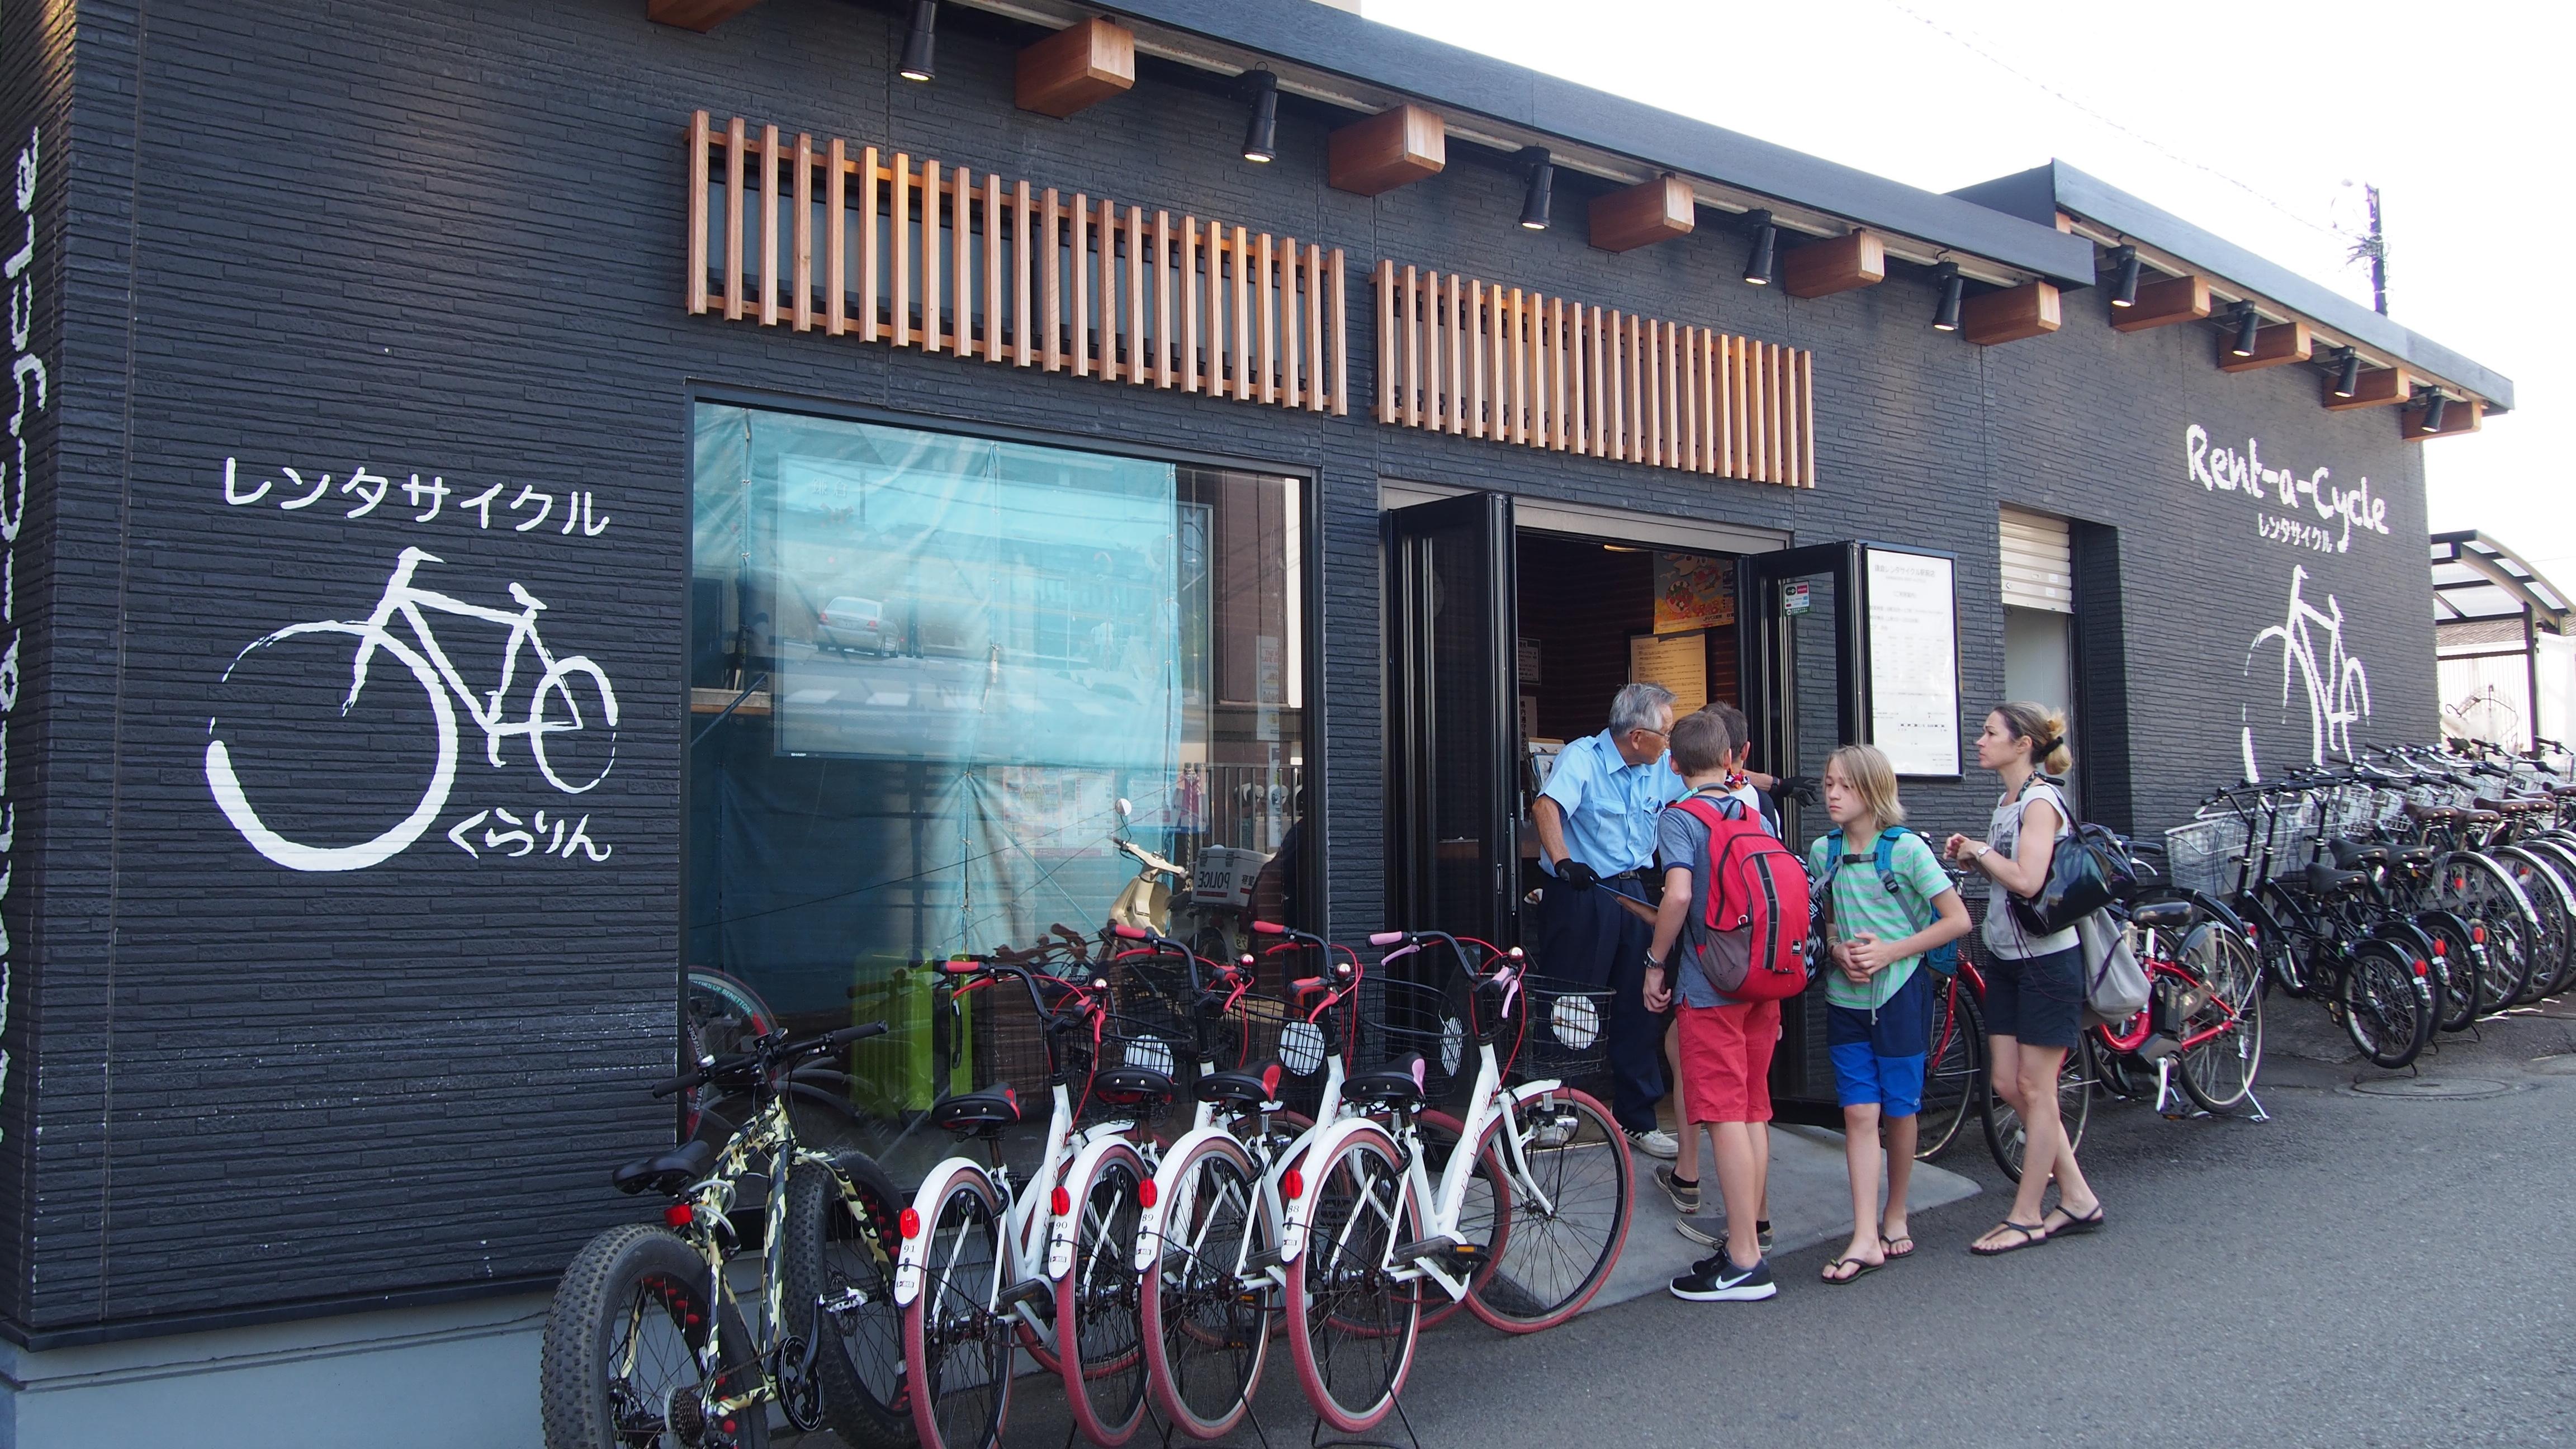 Kamakura Renta-a-Cycle Shop image